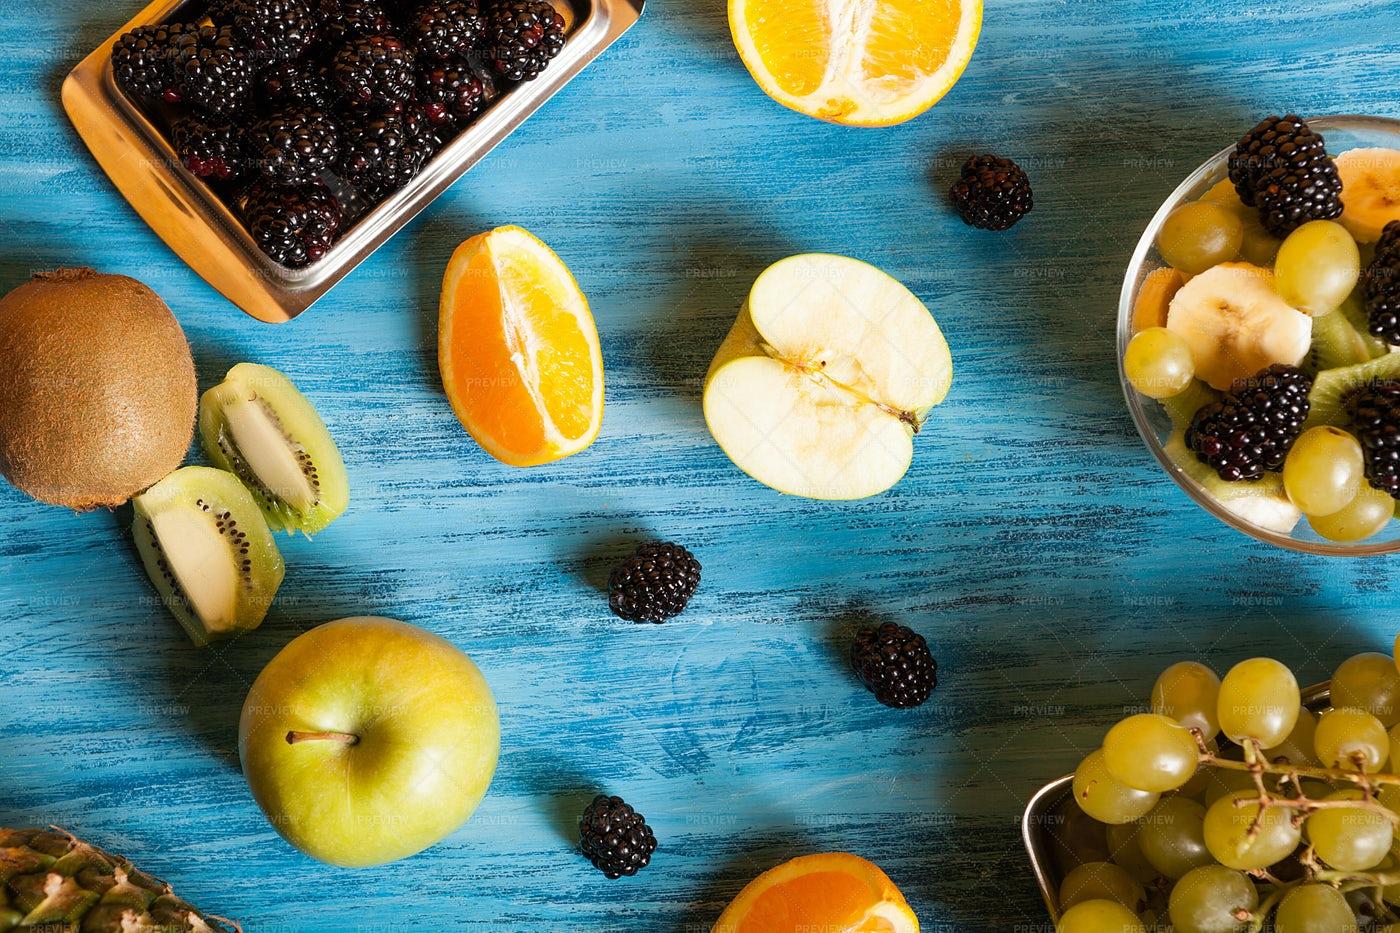 Apple, Oranges, Kiwi and Berries: Stock Photos